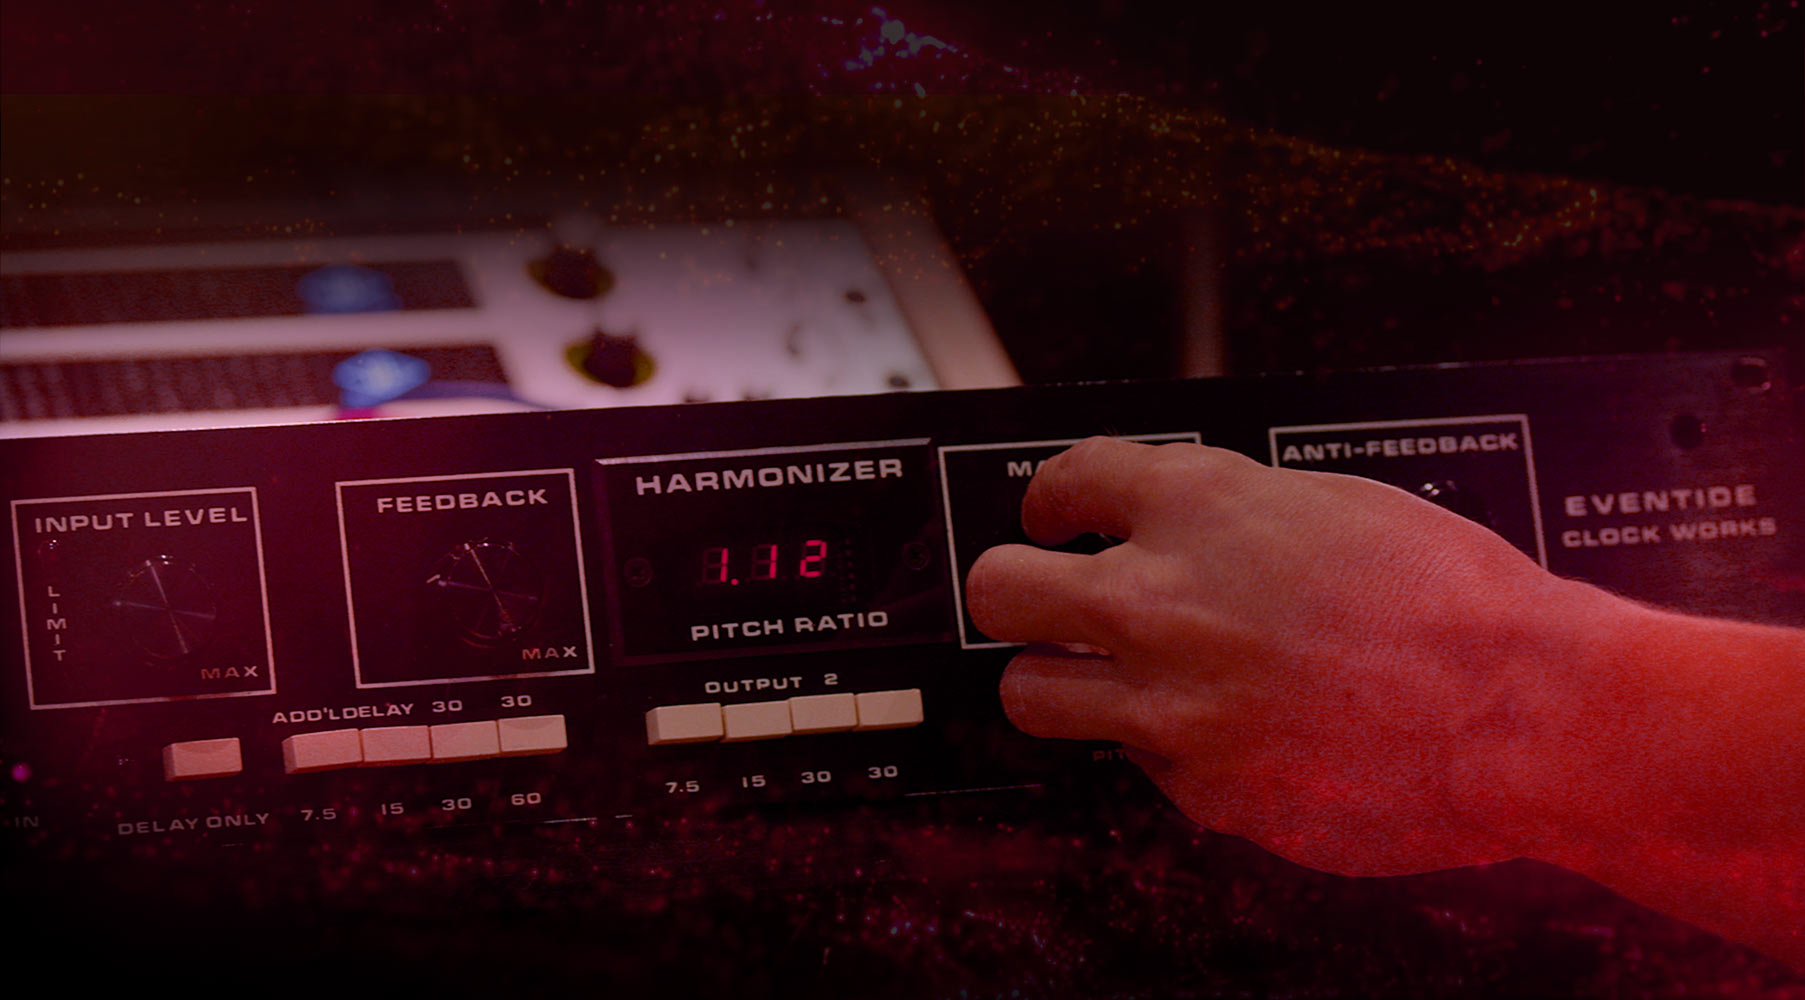 Eventide® H910 Harmonizer